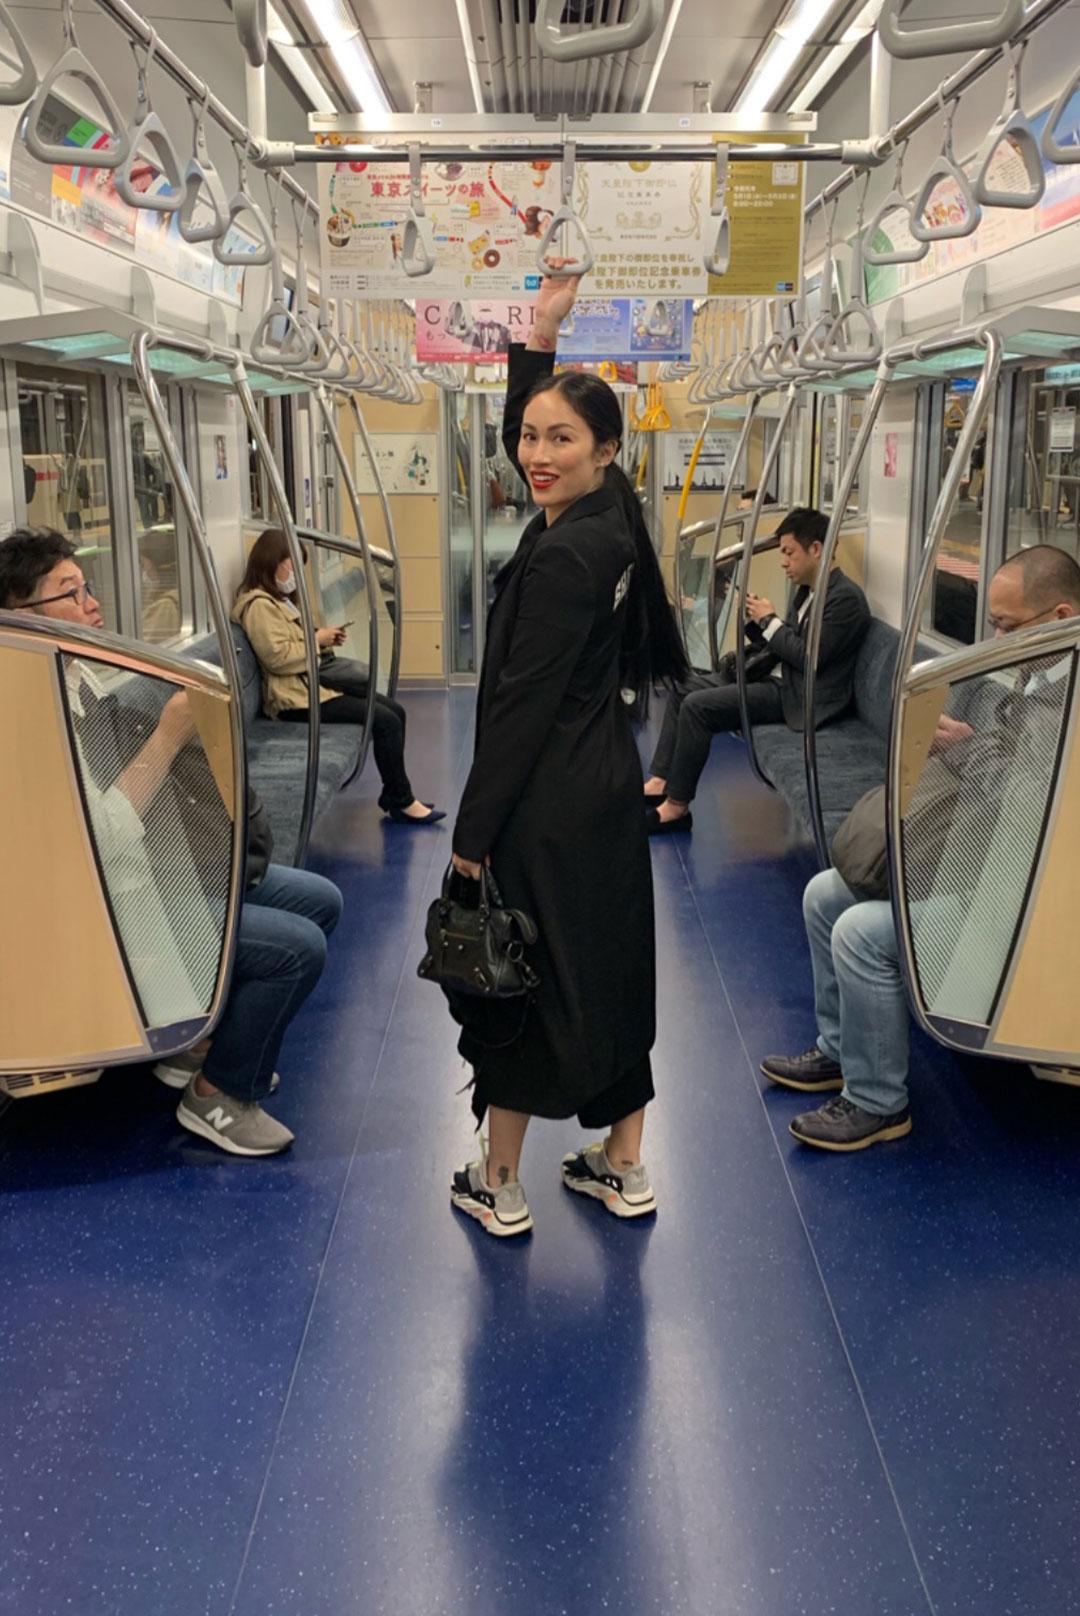 _subway